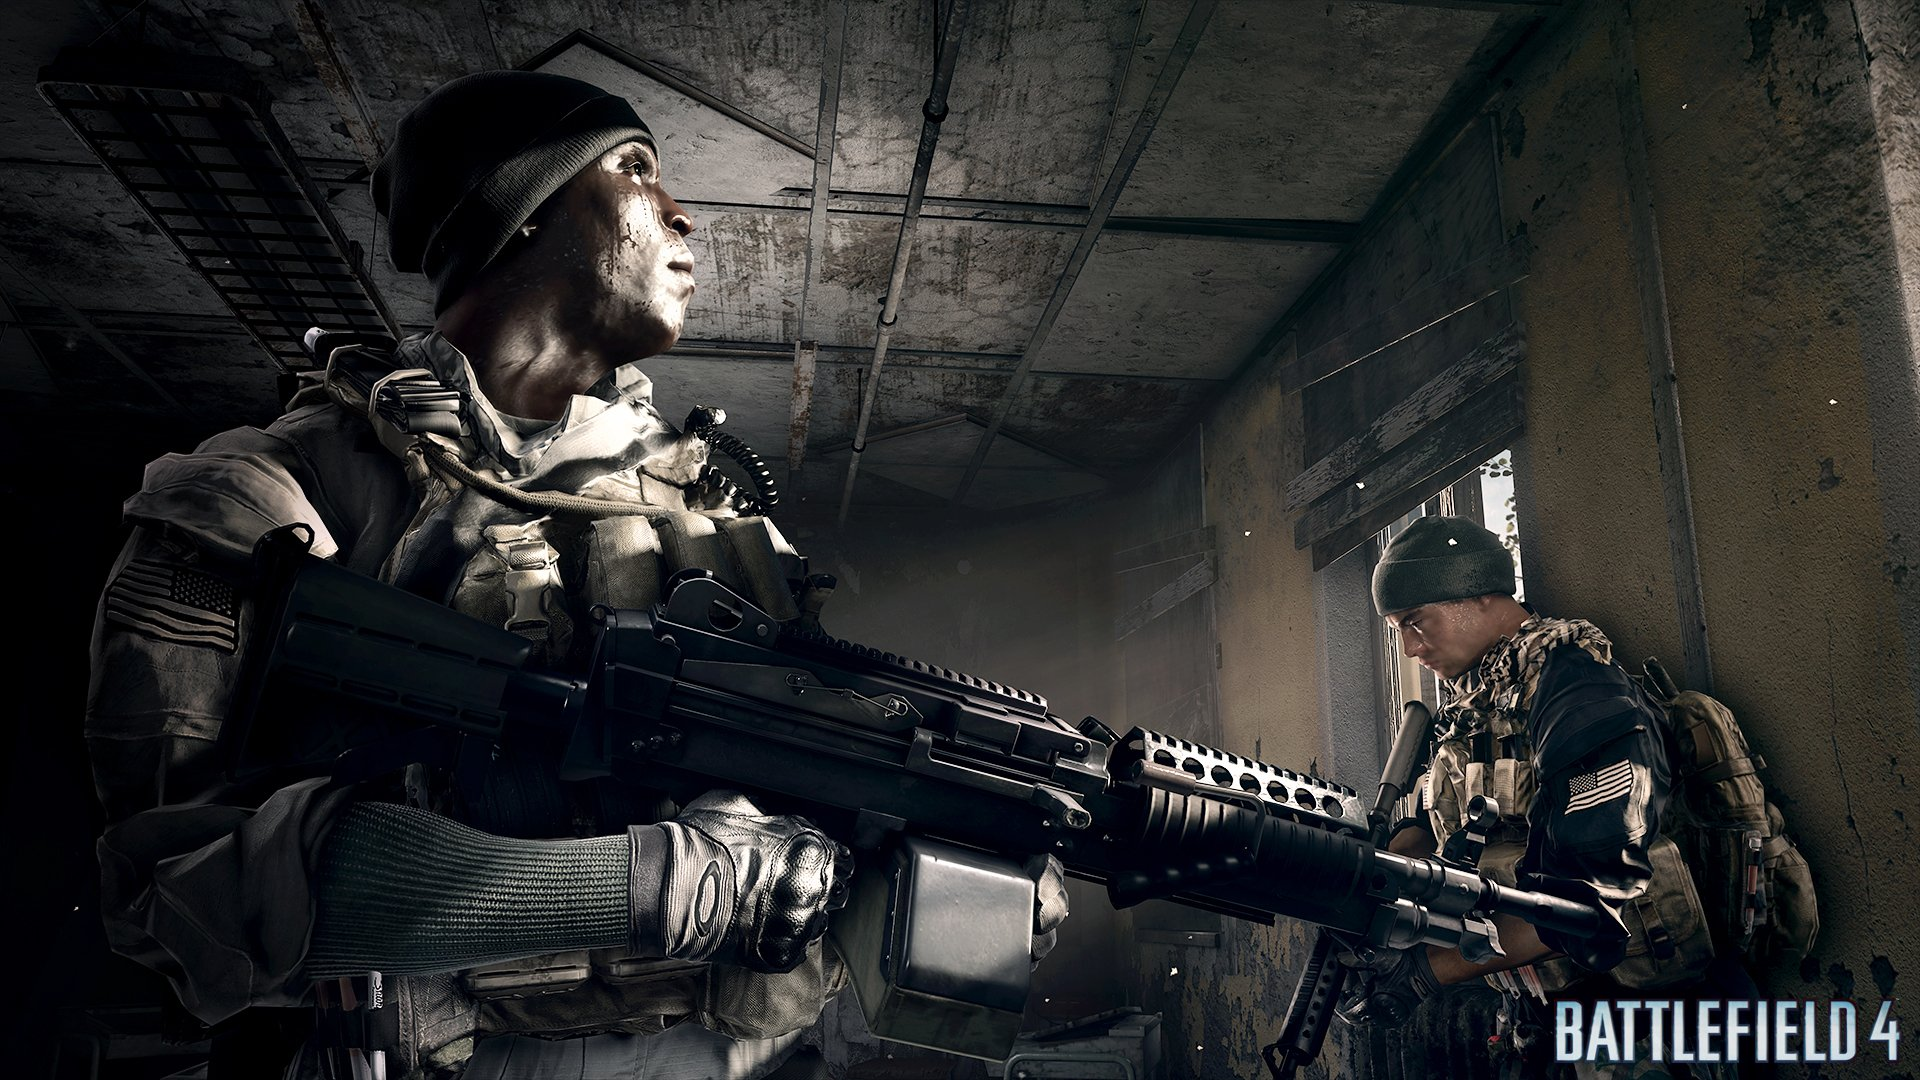 Battlefield 4 - photorealism at last?